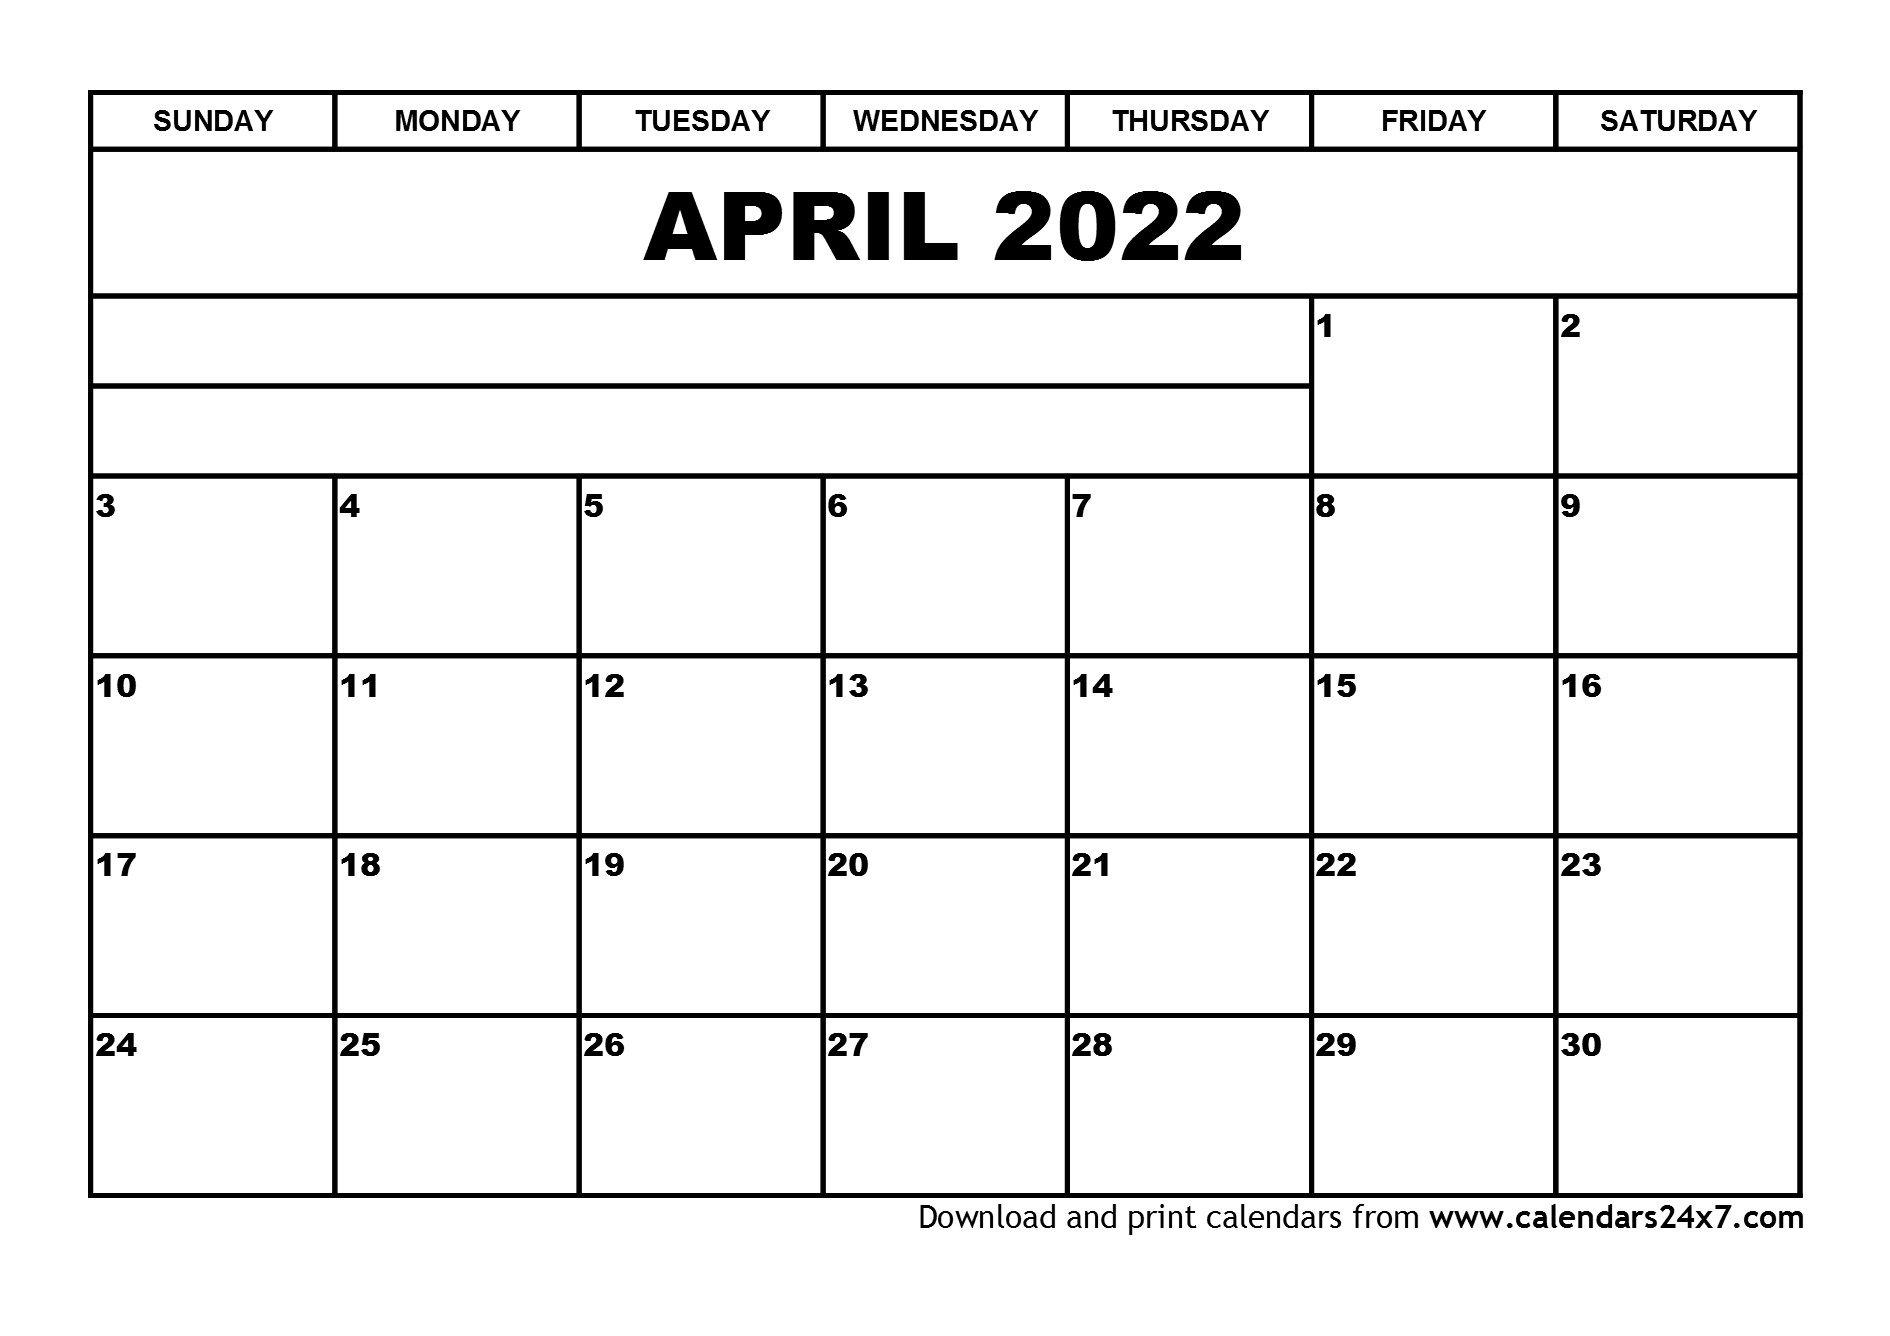 April 2022 Calendar & May 2022 Calendar intended for Calendar April 2022 Printable Pdf